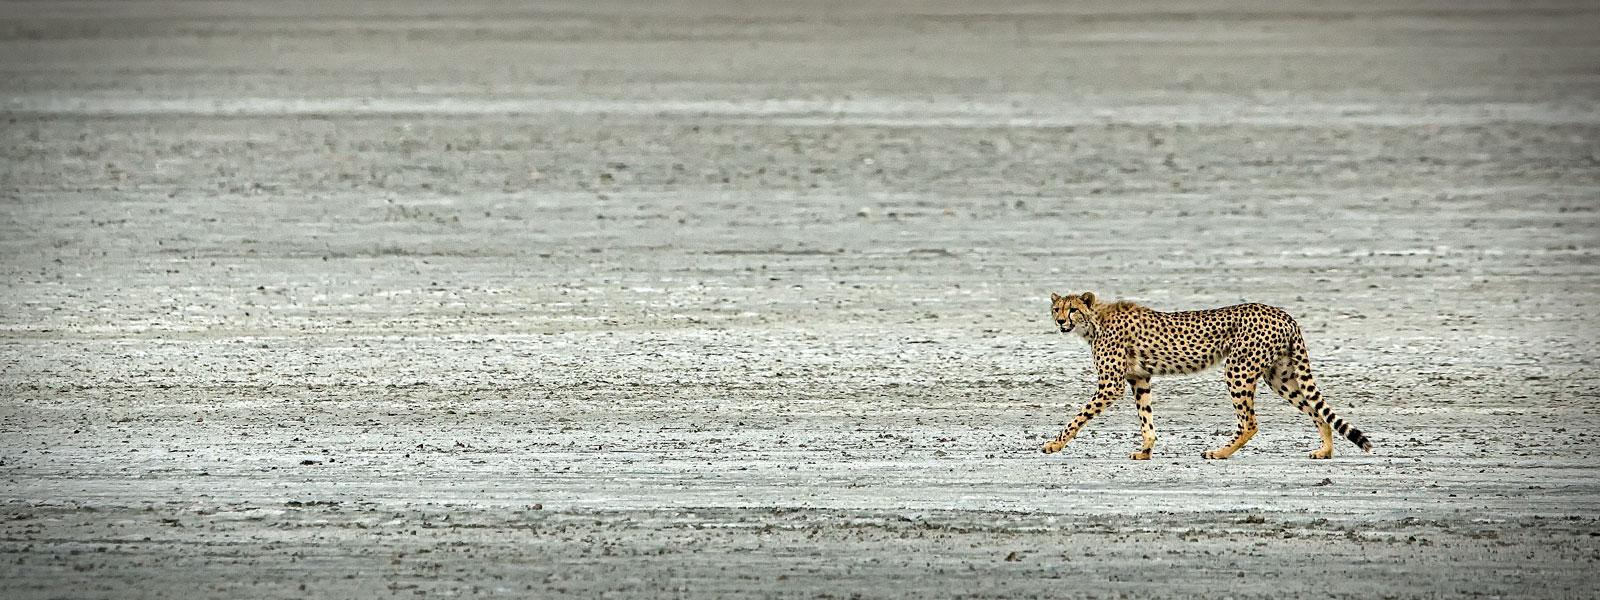 MG_0094-Cheetah-copy